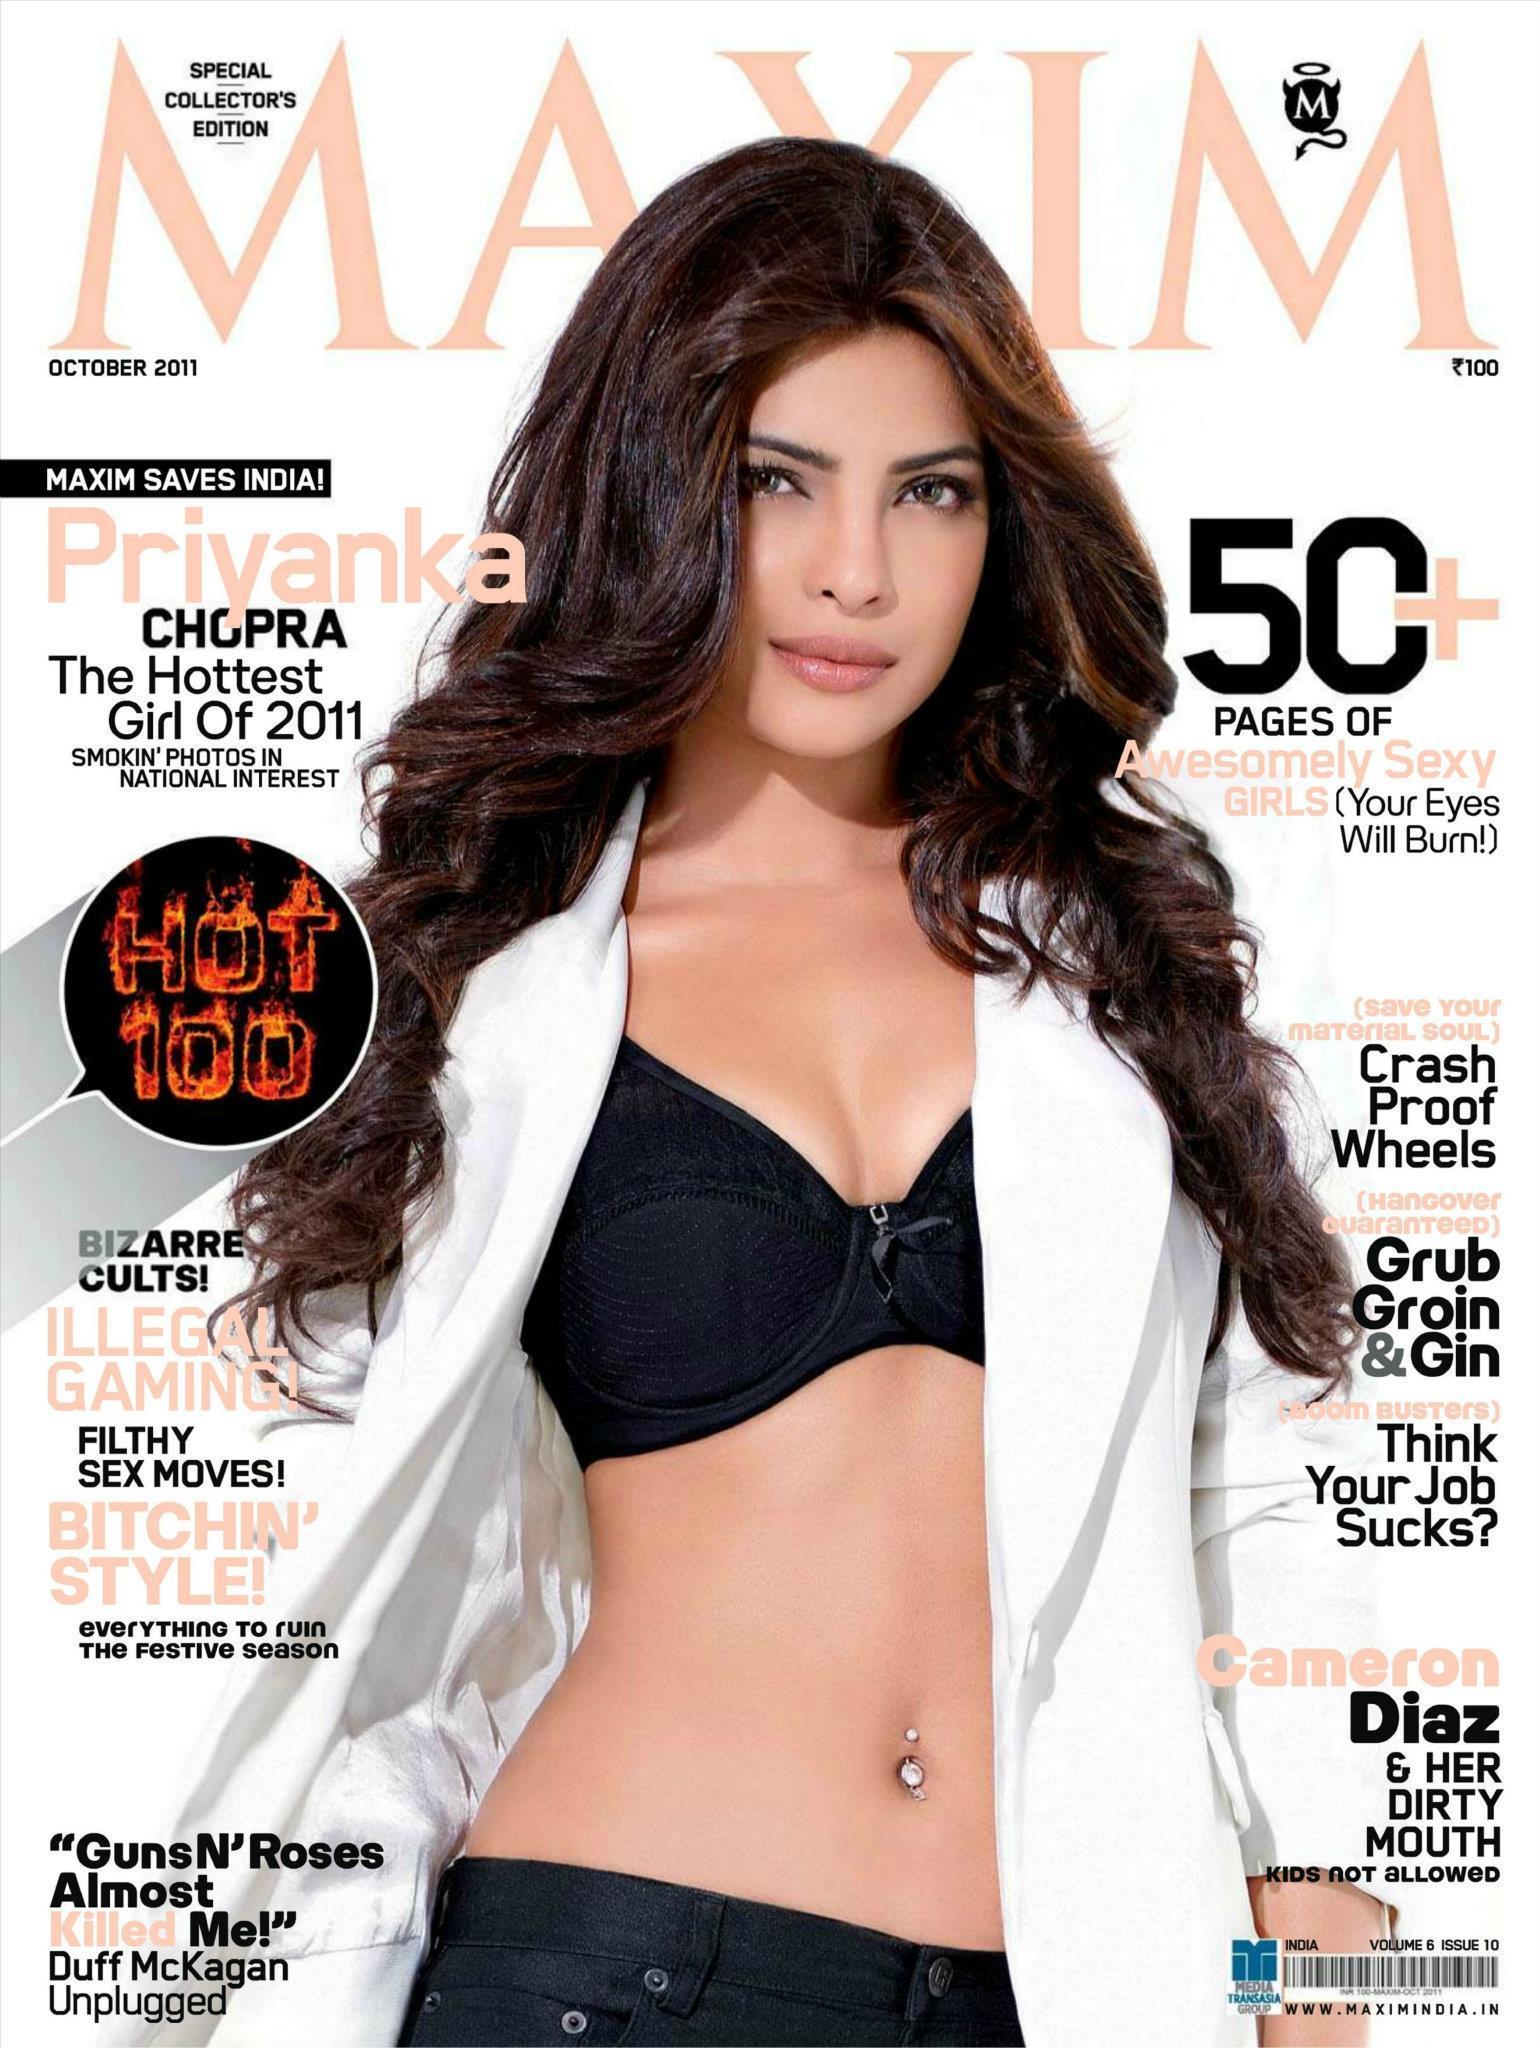 Priyanka Chopra - Various Magazine Covers Photos - Sexy Actress Pictures | Hot Actress Pictures - ActressSnaps.com